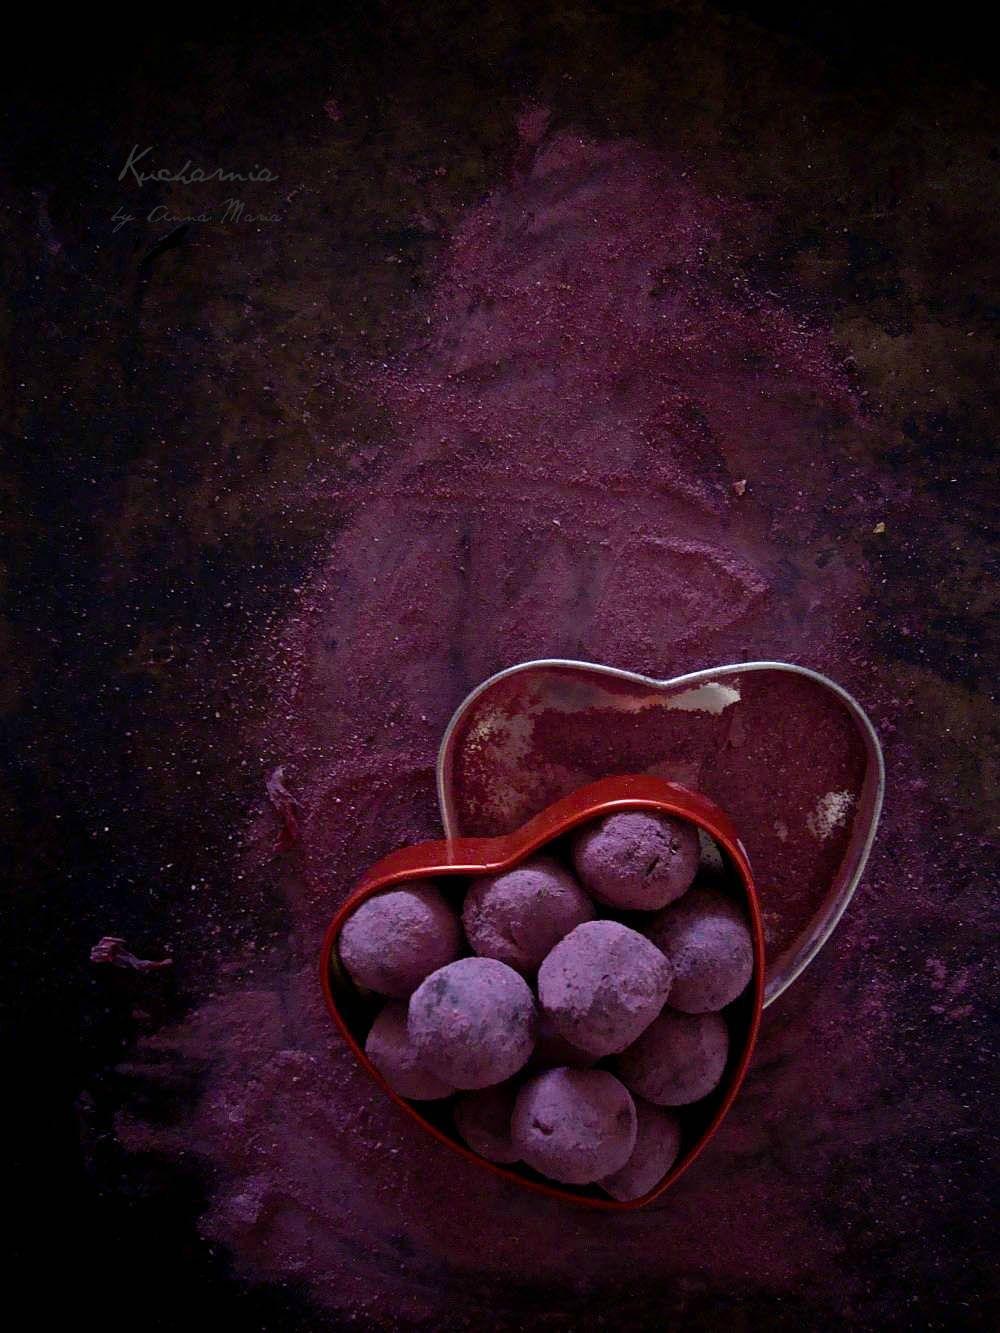 http://kucharnia.blogspot.co.uk/2014/02/afrodyzjaki-hibiskus-i-czekolada-trufle.html